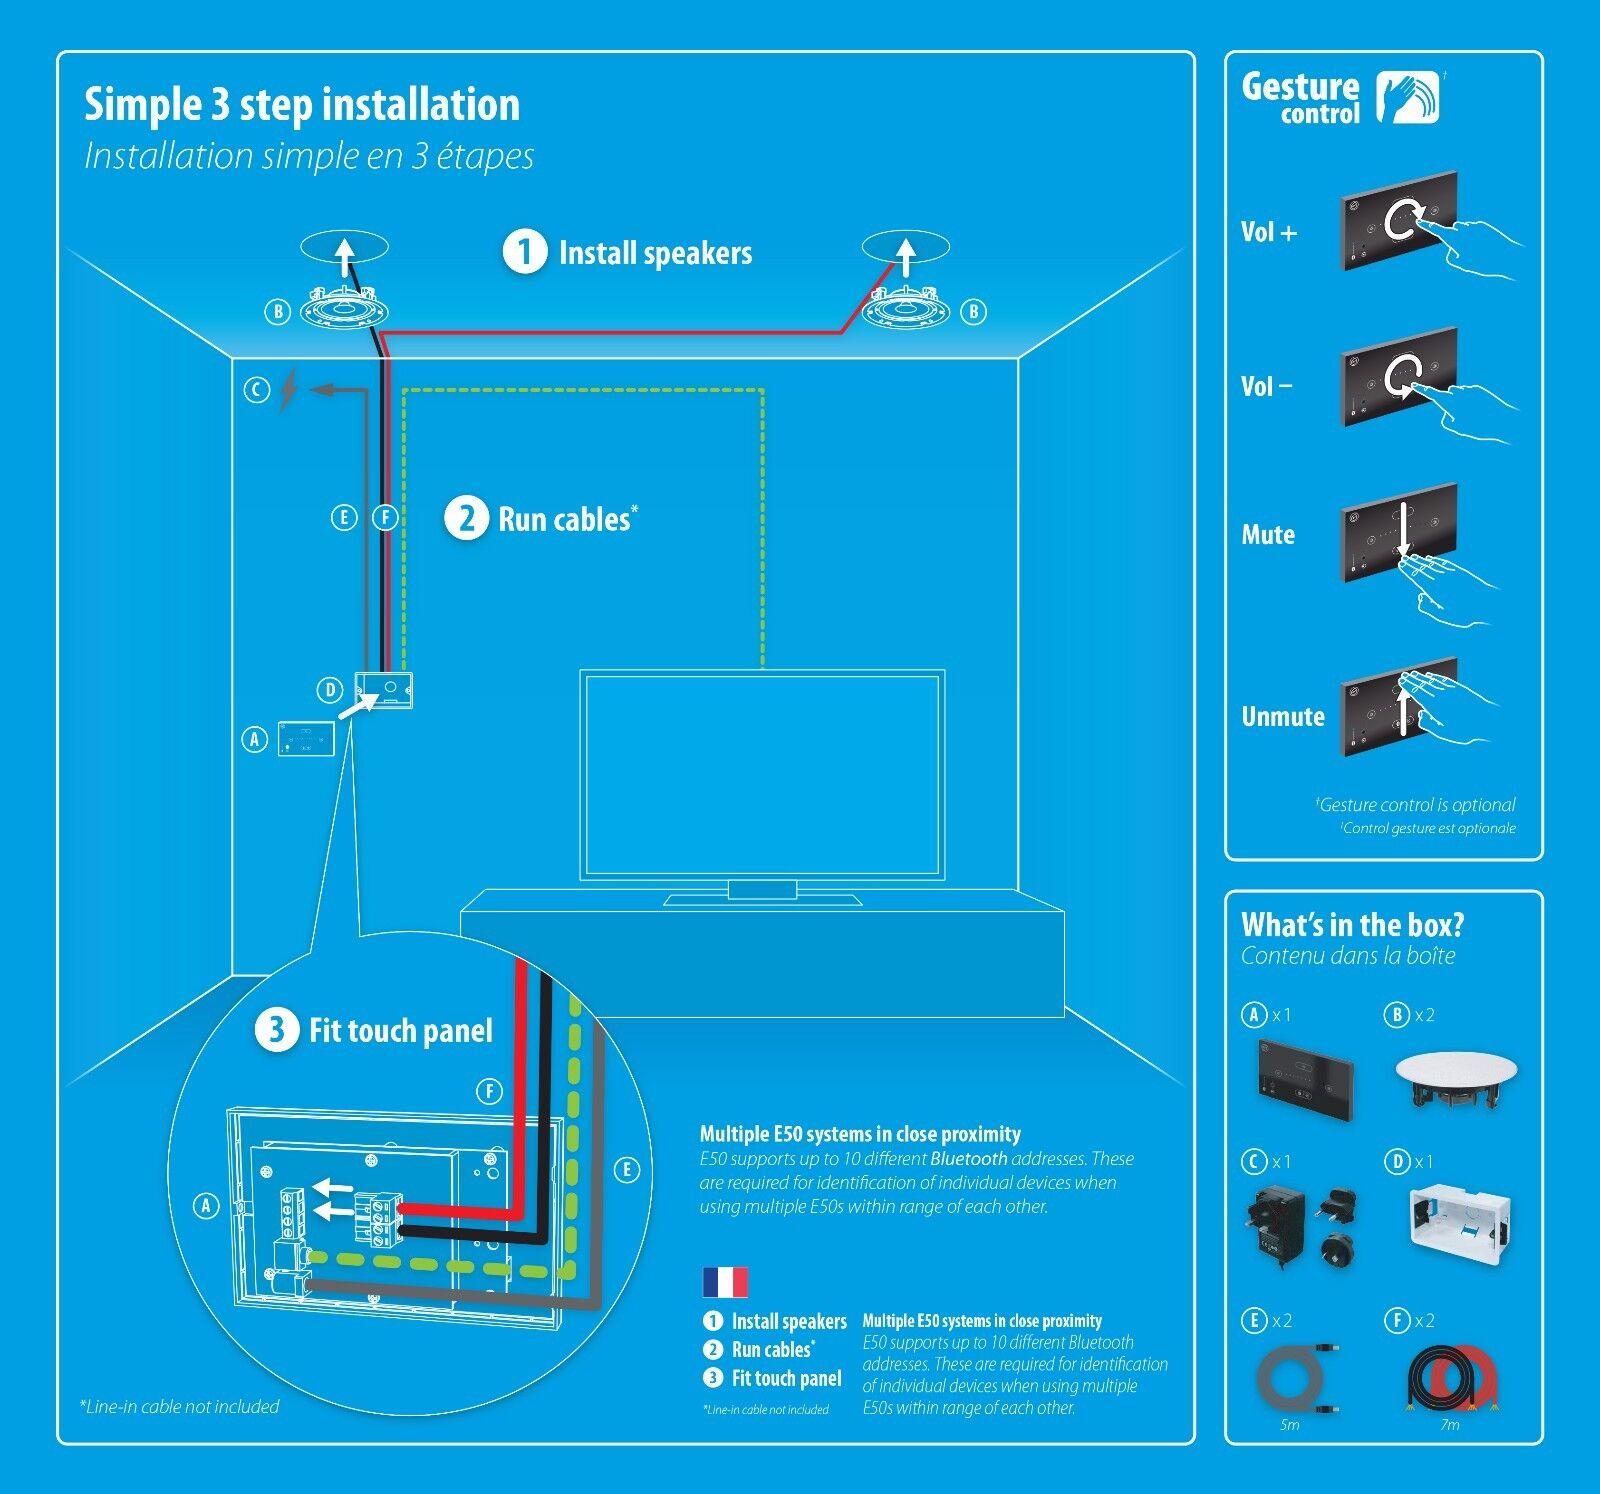 Systemline E50 Bluetooth Speaker System Gesture Control Only | eBay